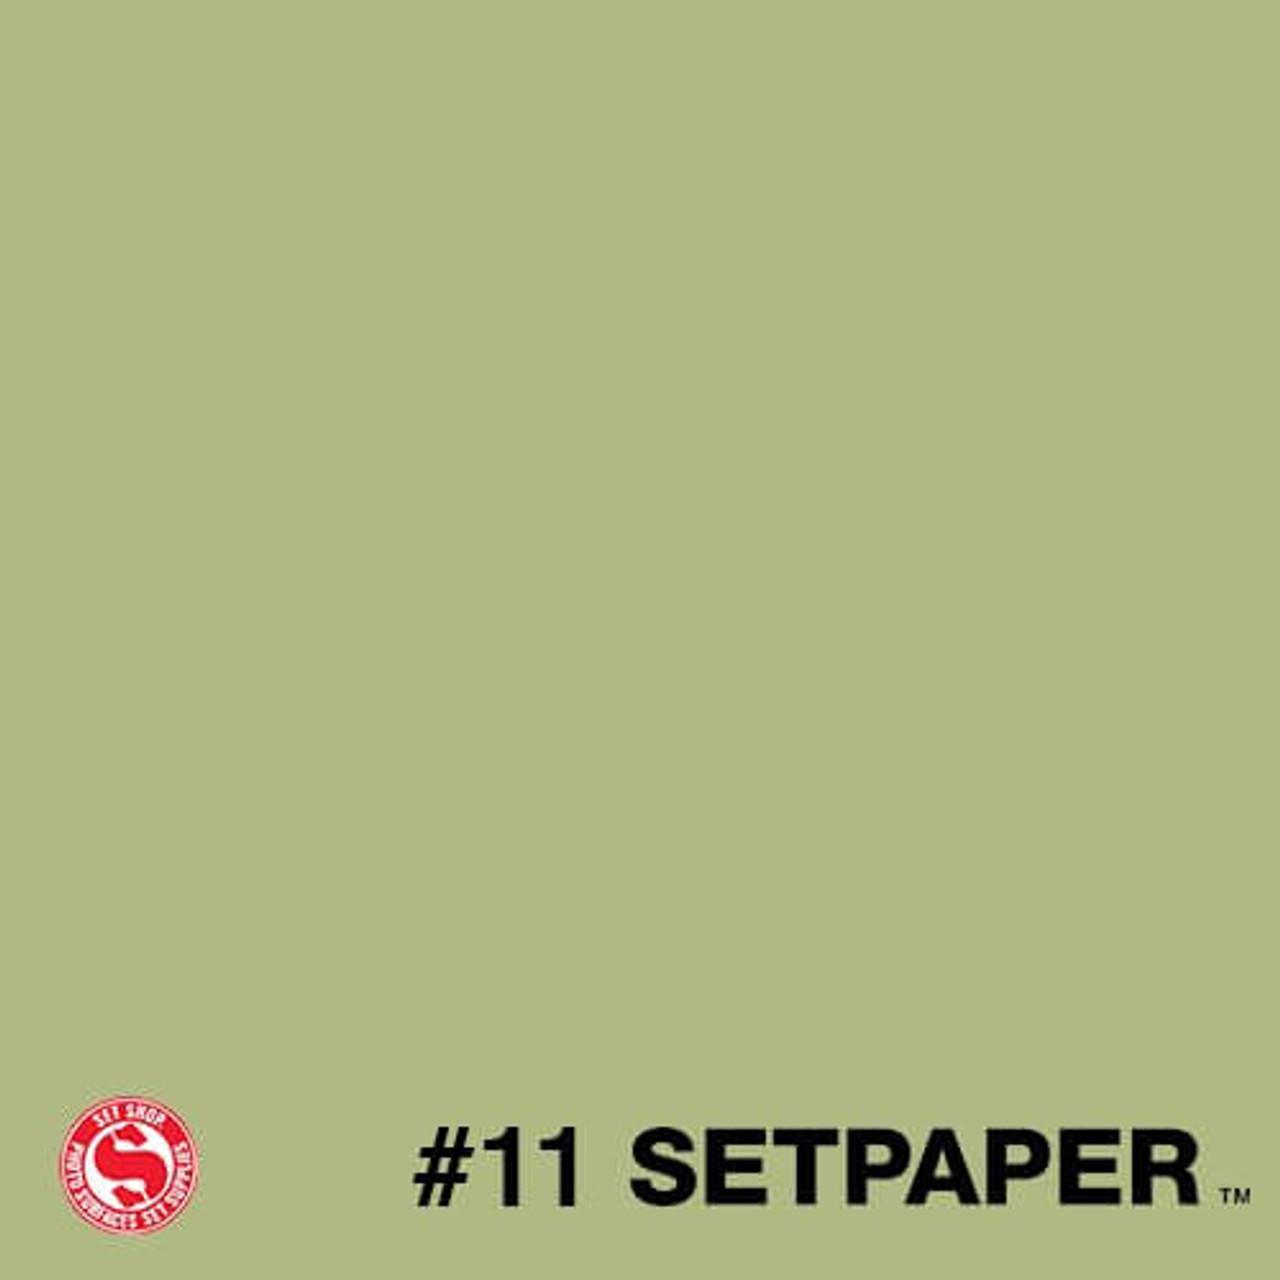 "211 SETPAPER - SUNNY GREEN 26"" x 36' (0.66m  X 11m)"